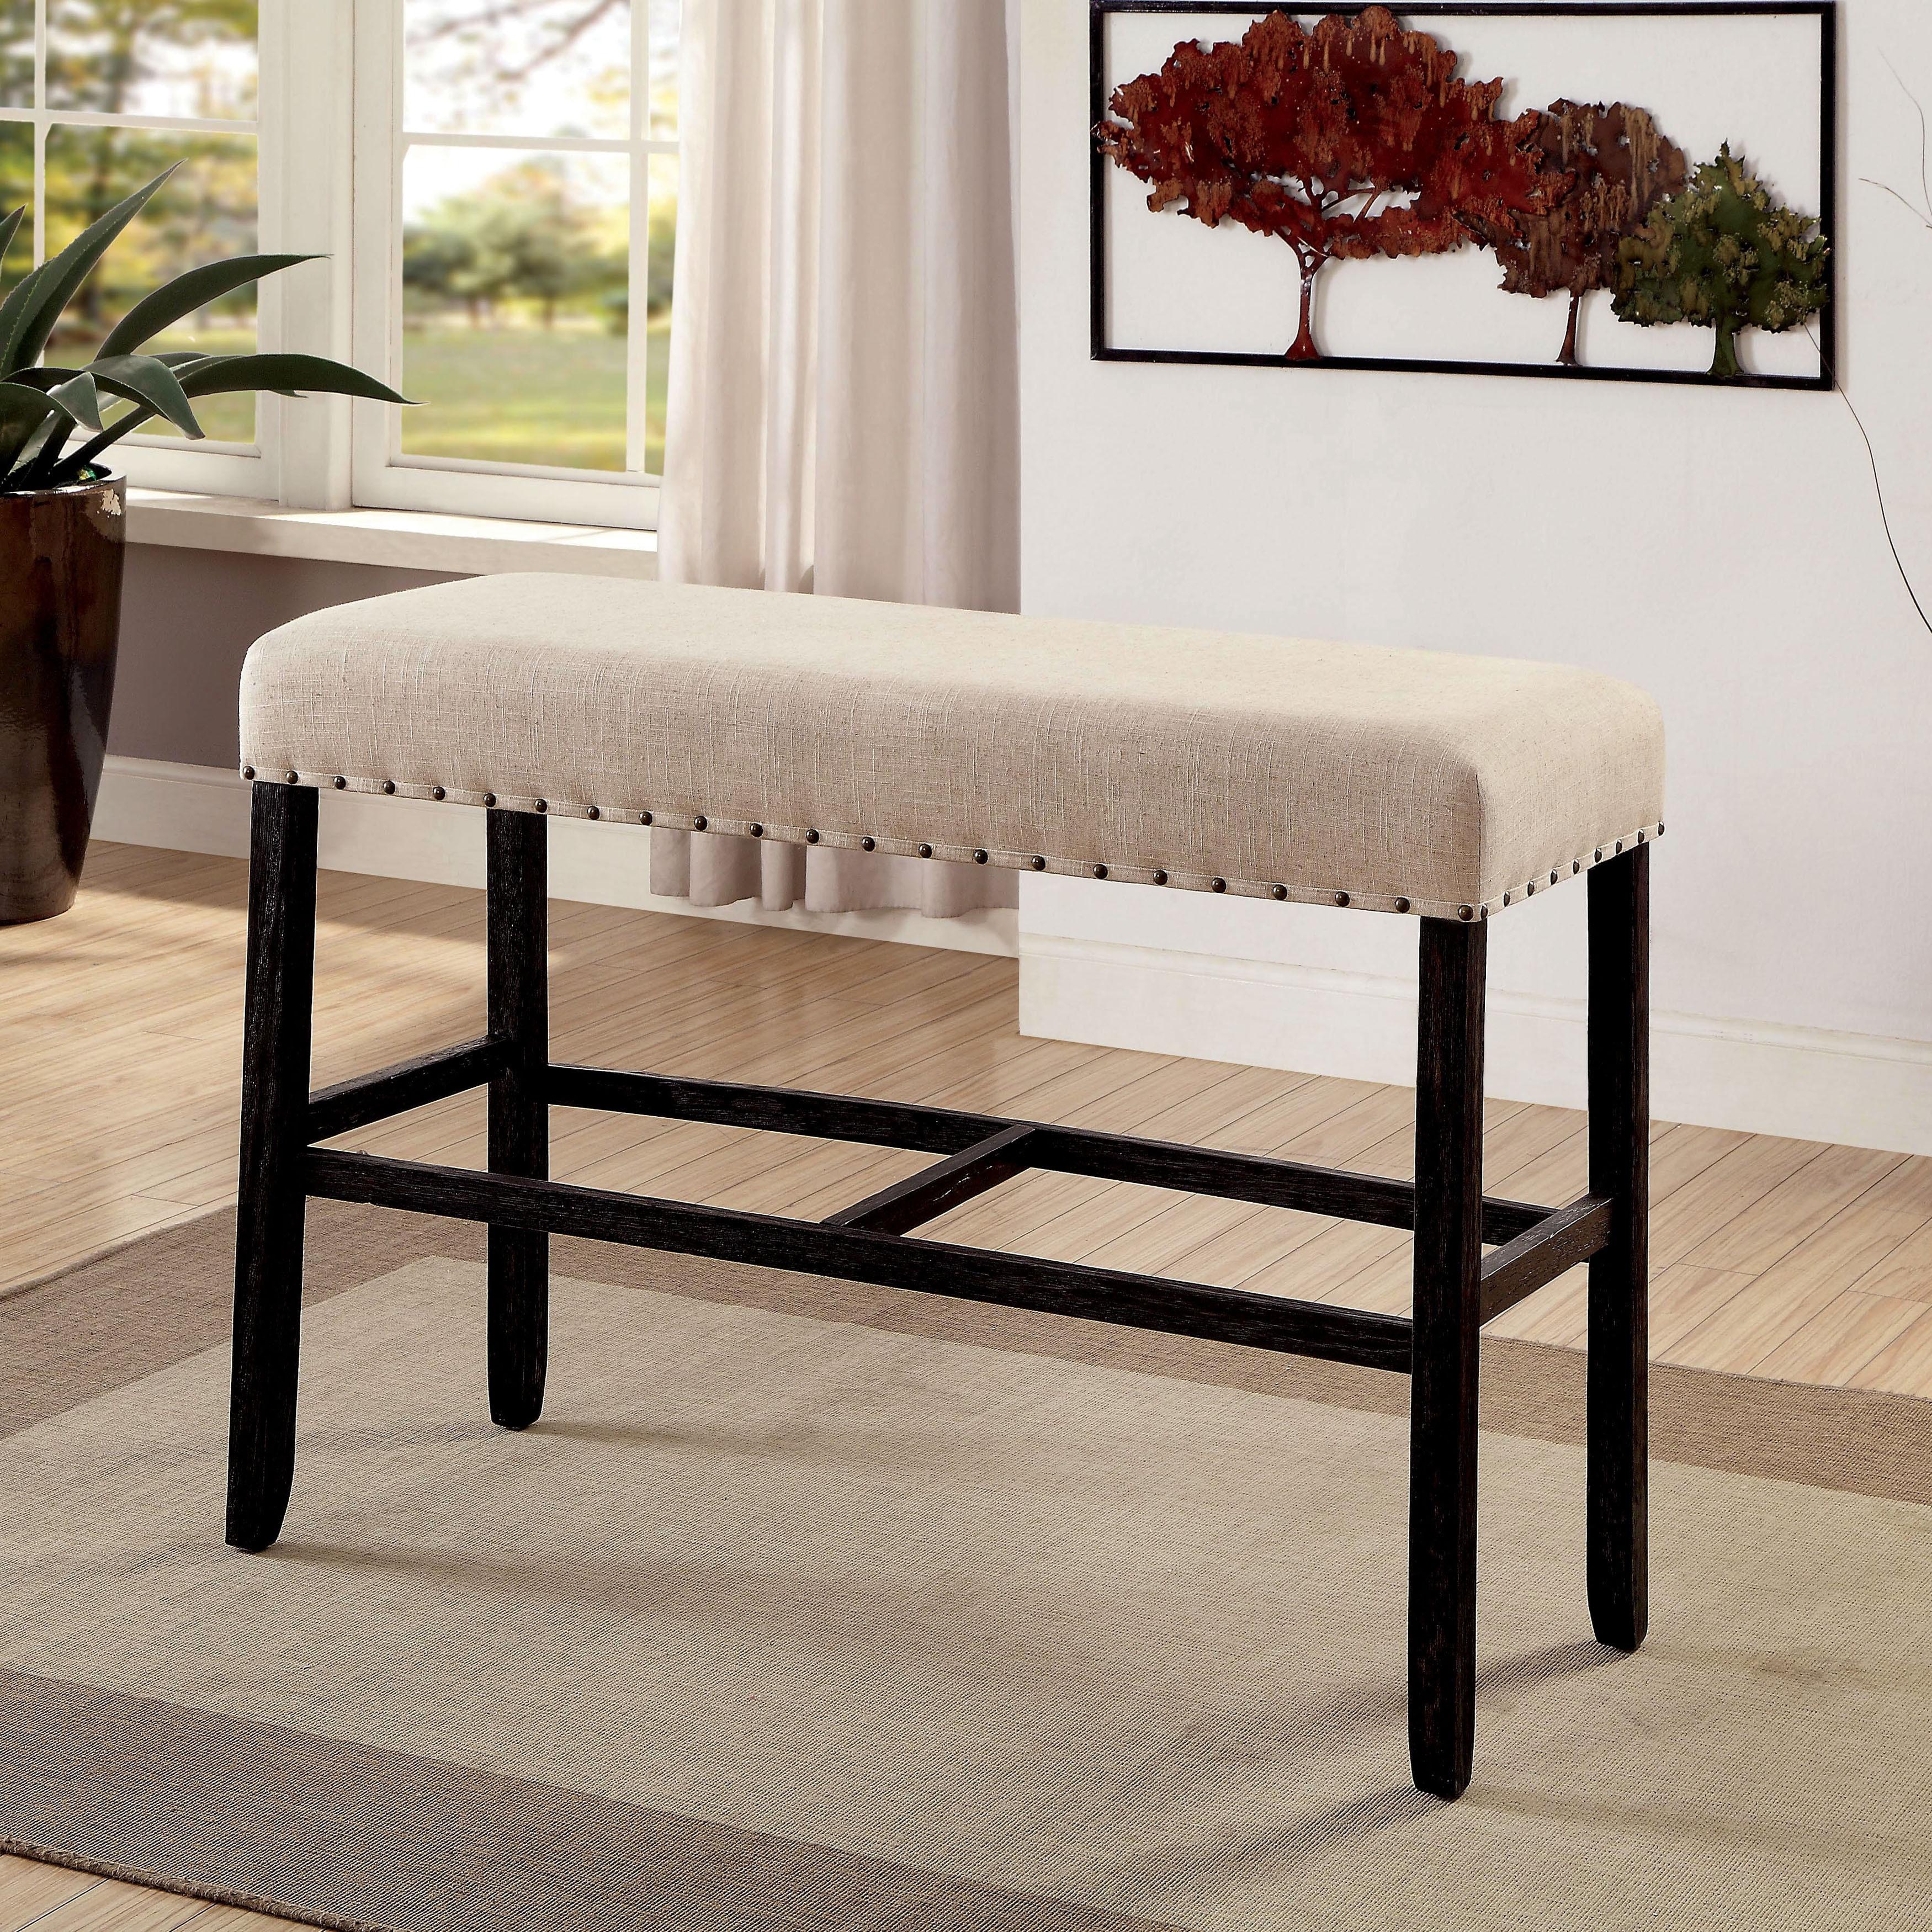 Furniture Of America Telara Contemporary Antique Black Bar Height Dining  Bench